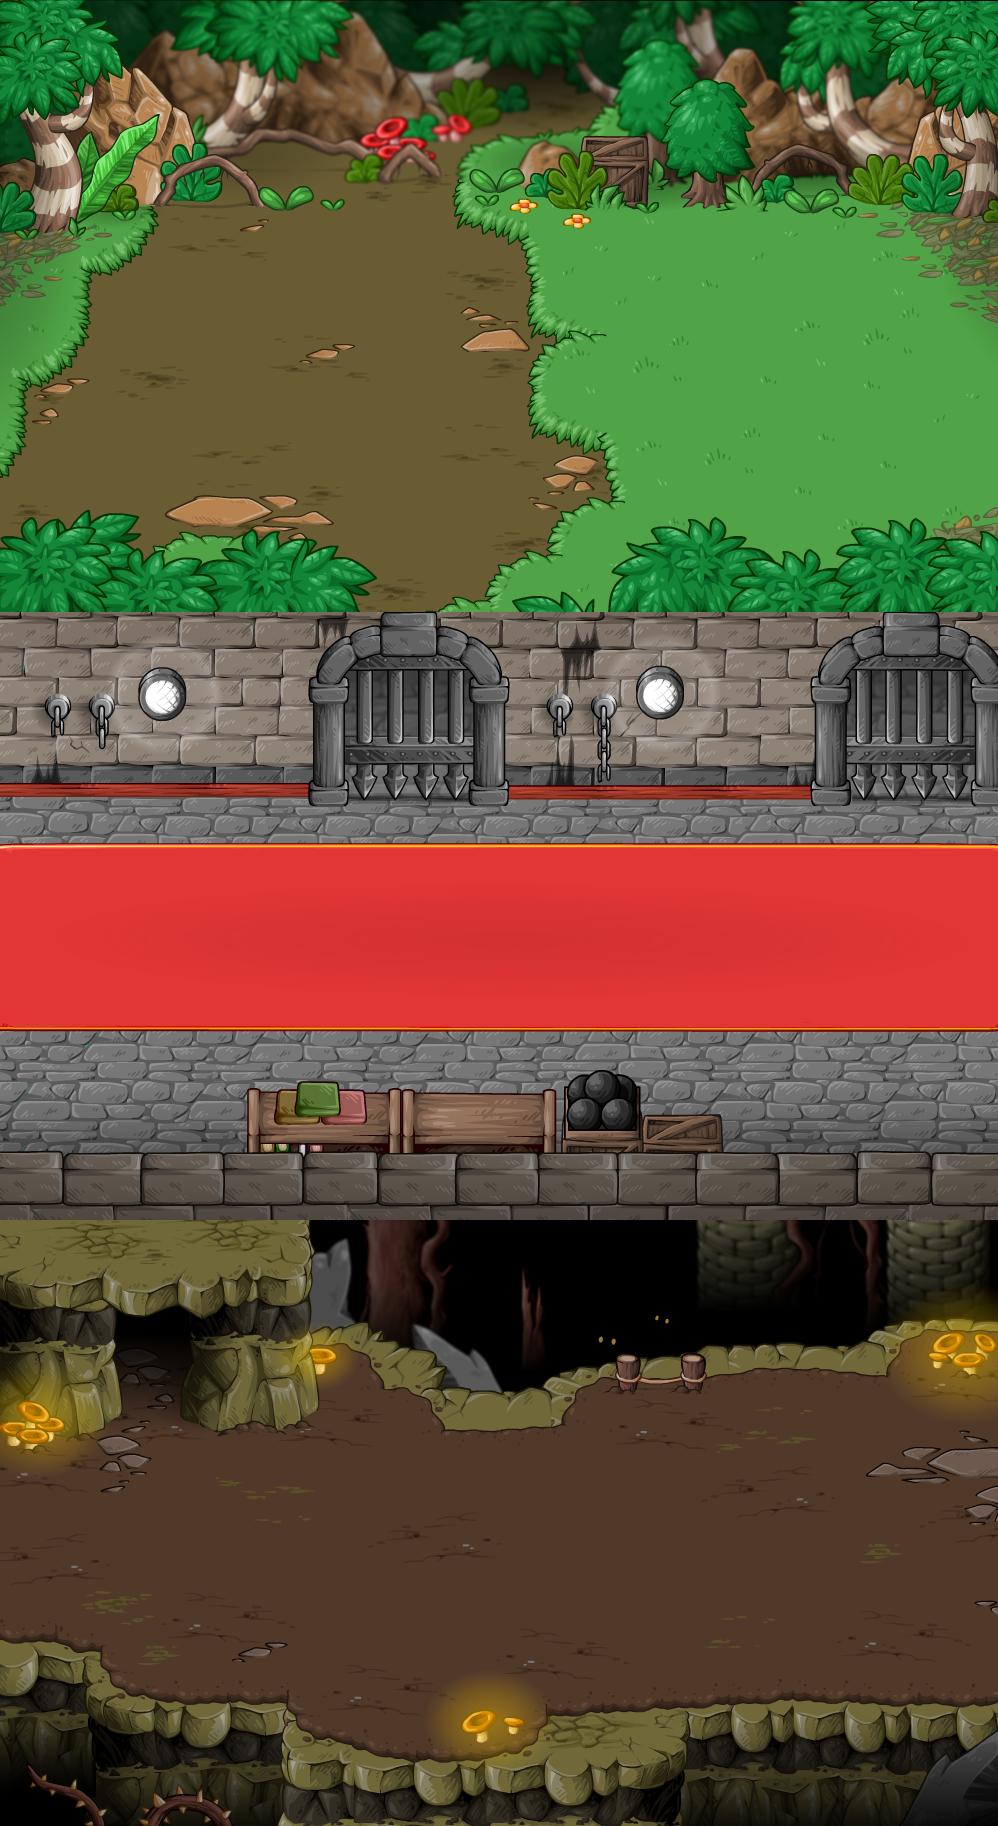 EBF5: Battle Backgrounds 3 + Rezzed by KupoGames